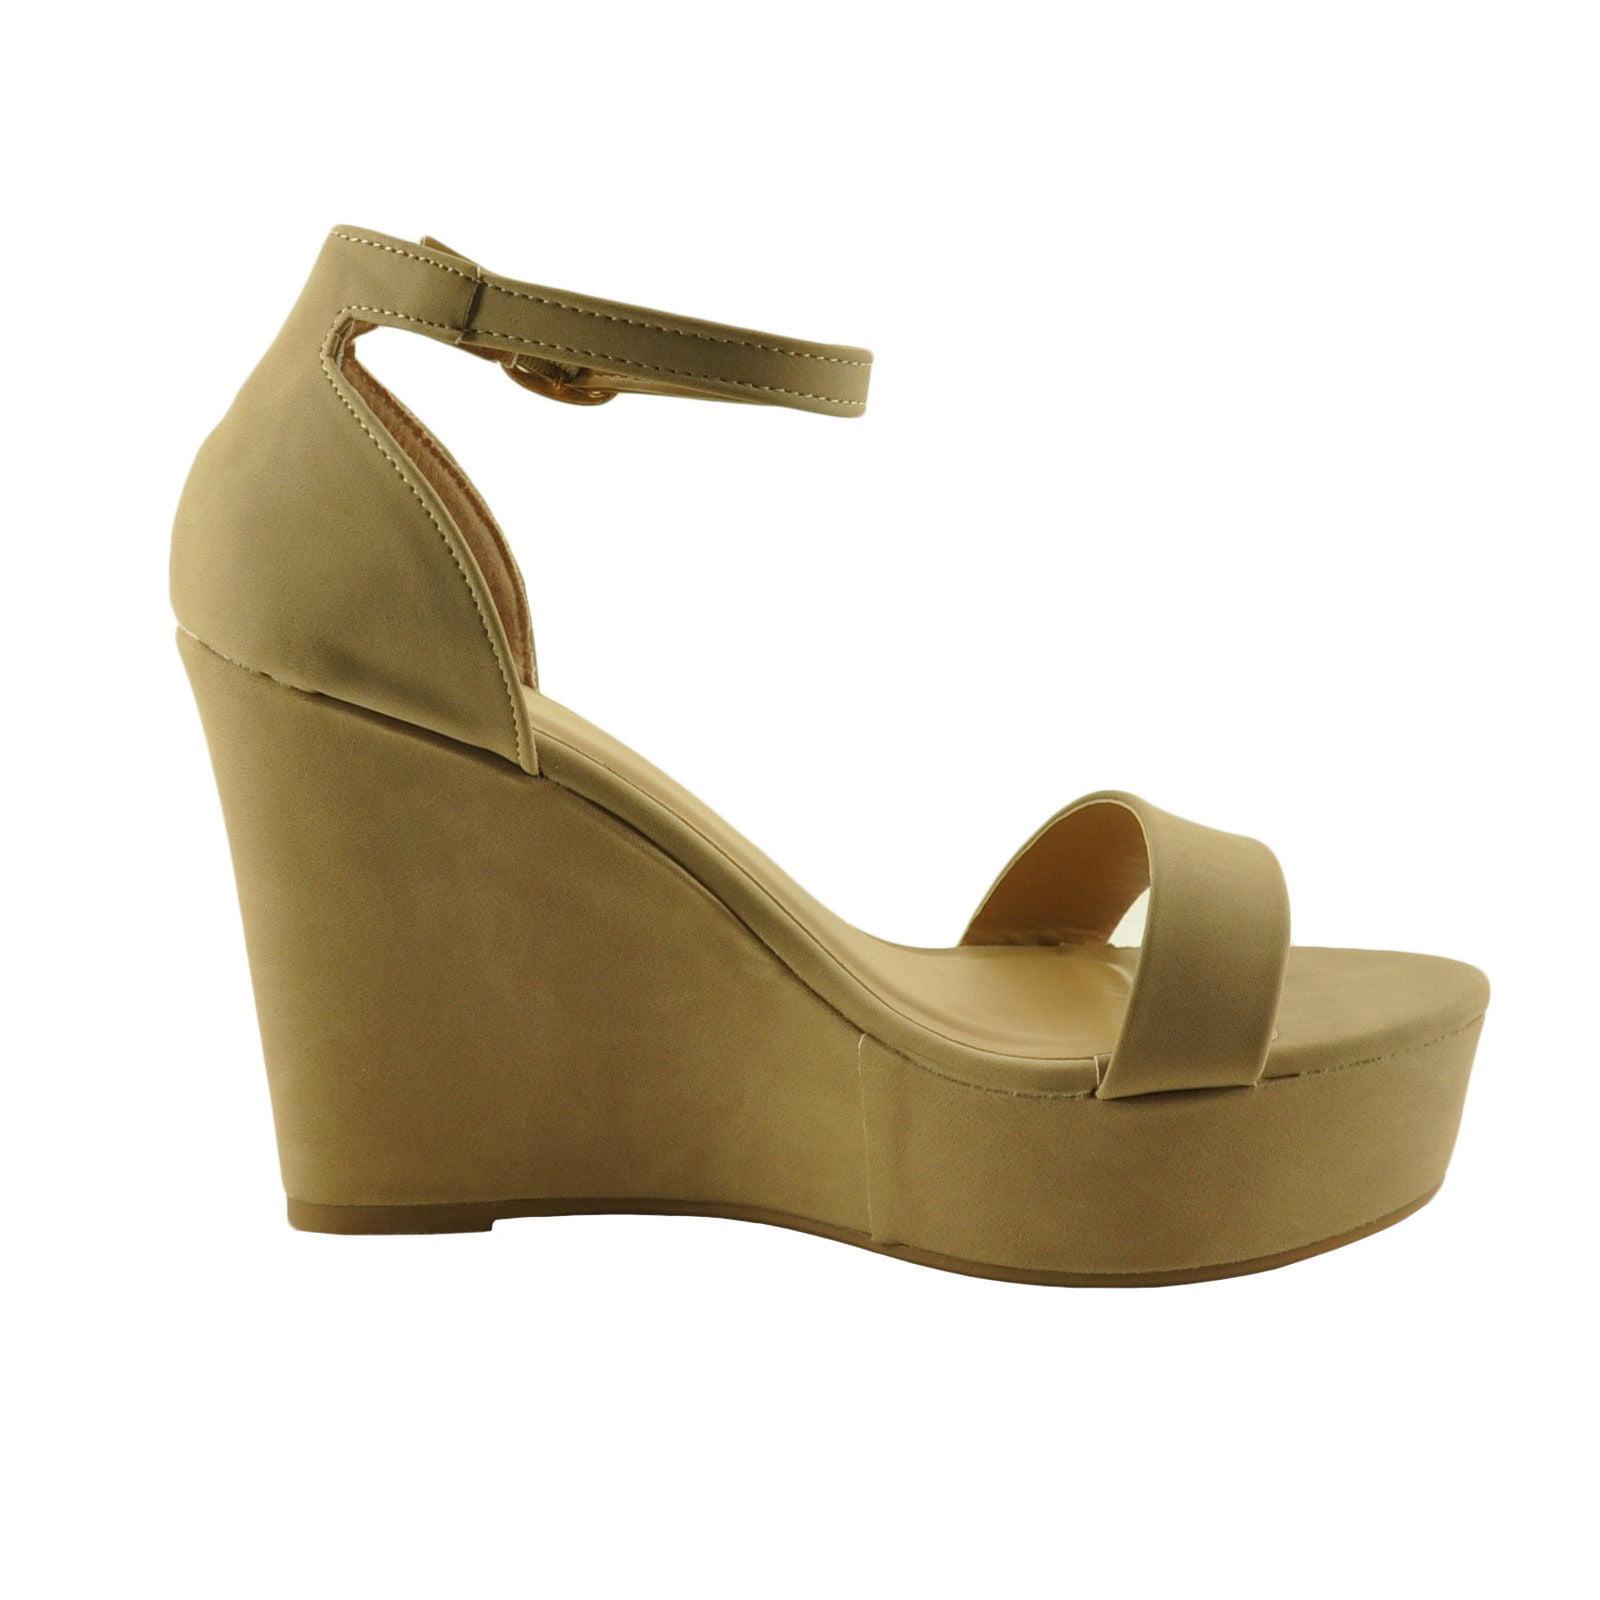 54d37069a82 Bamboo - Women s Shoes Bamboo Scorpio 21S Single Strap Platform Wedge -  Walmart.com